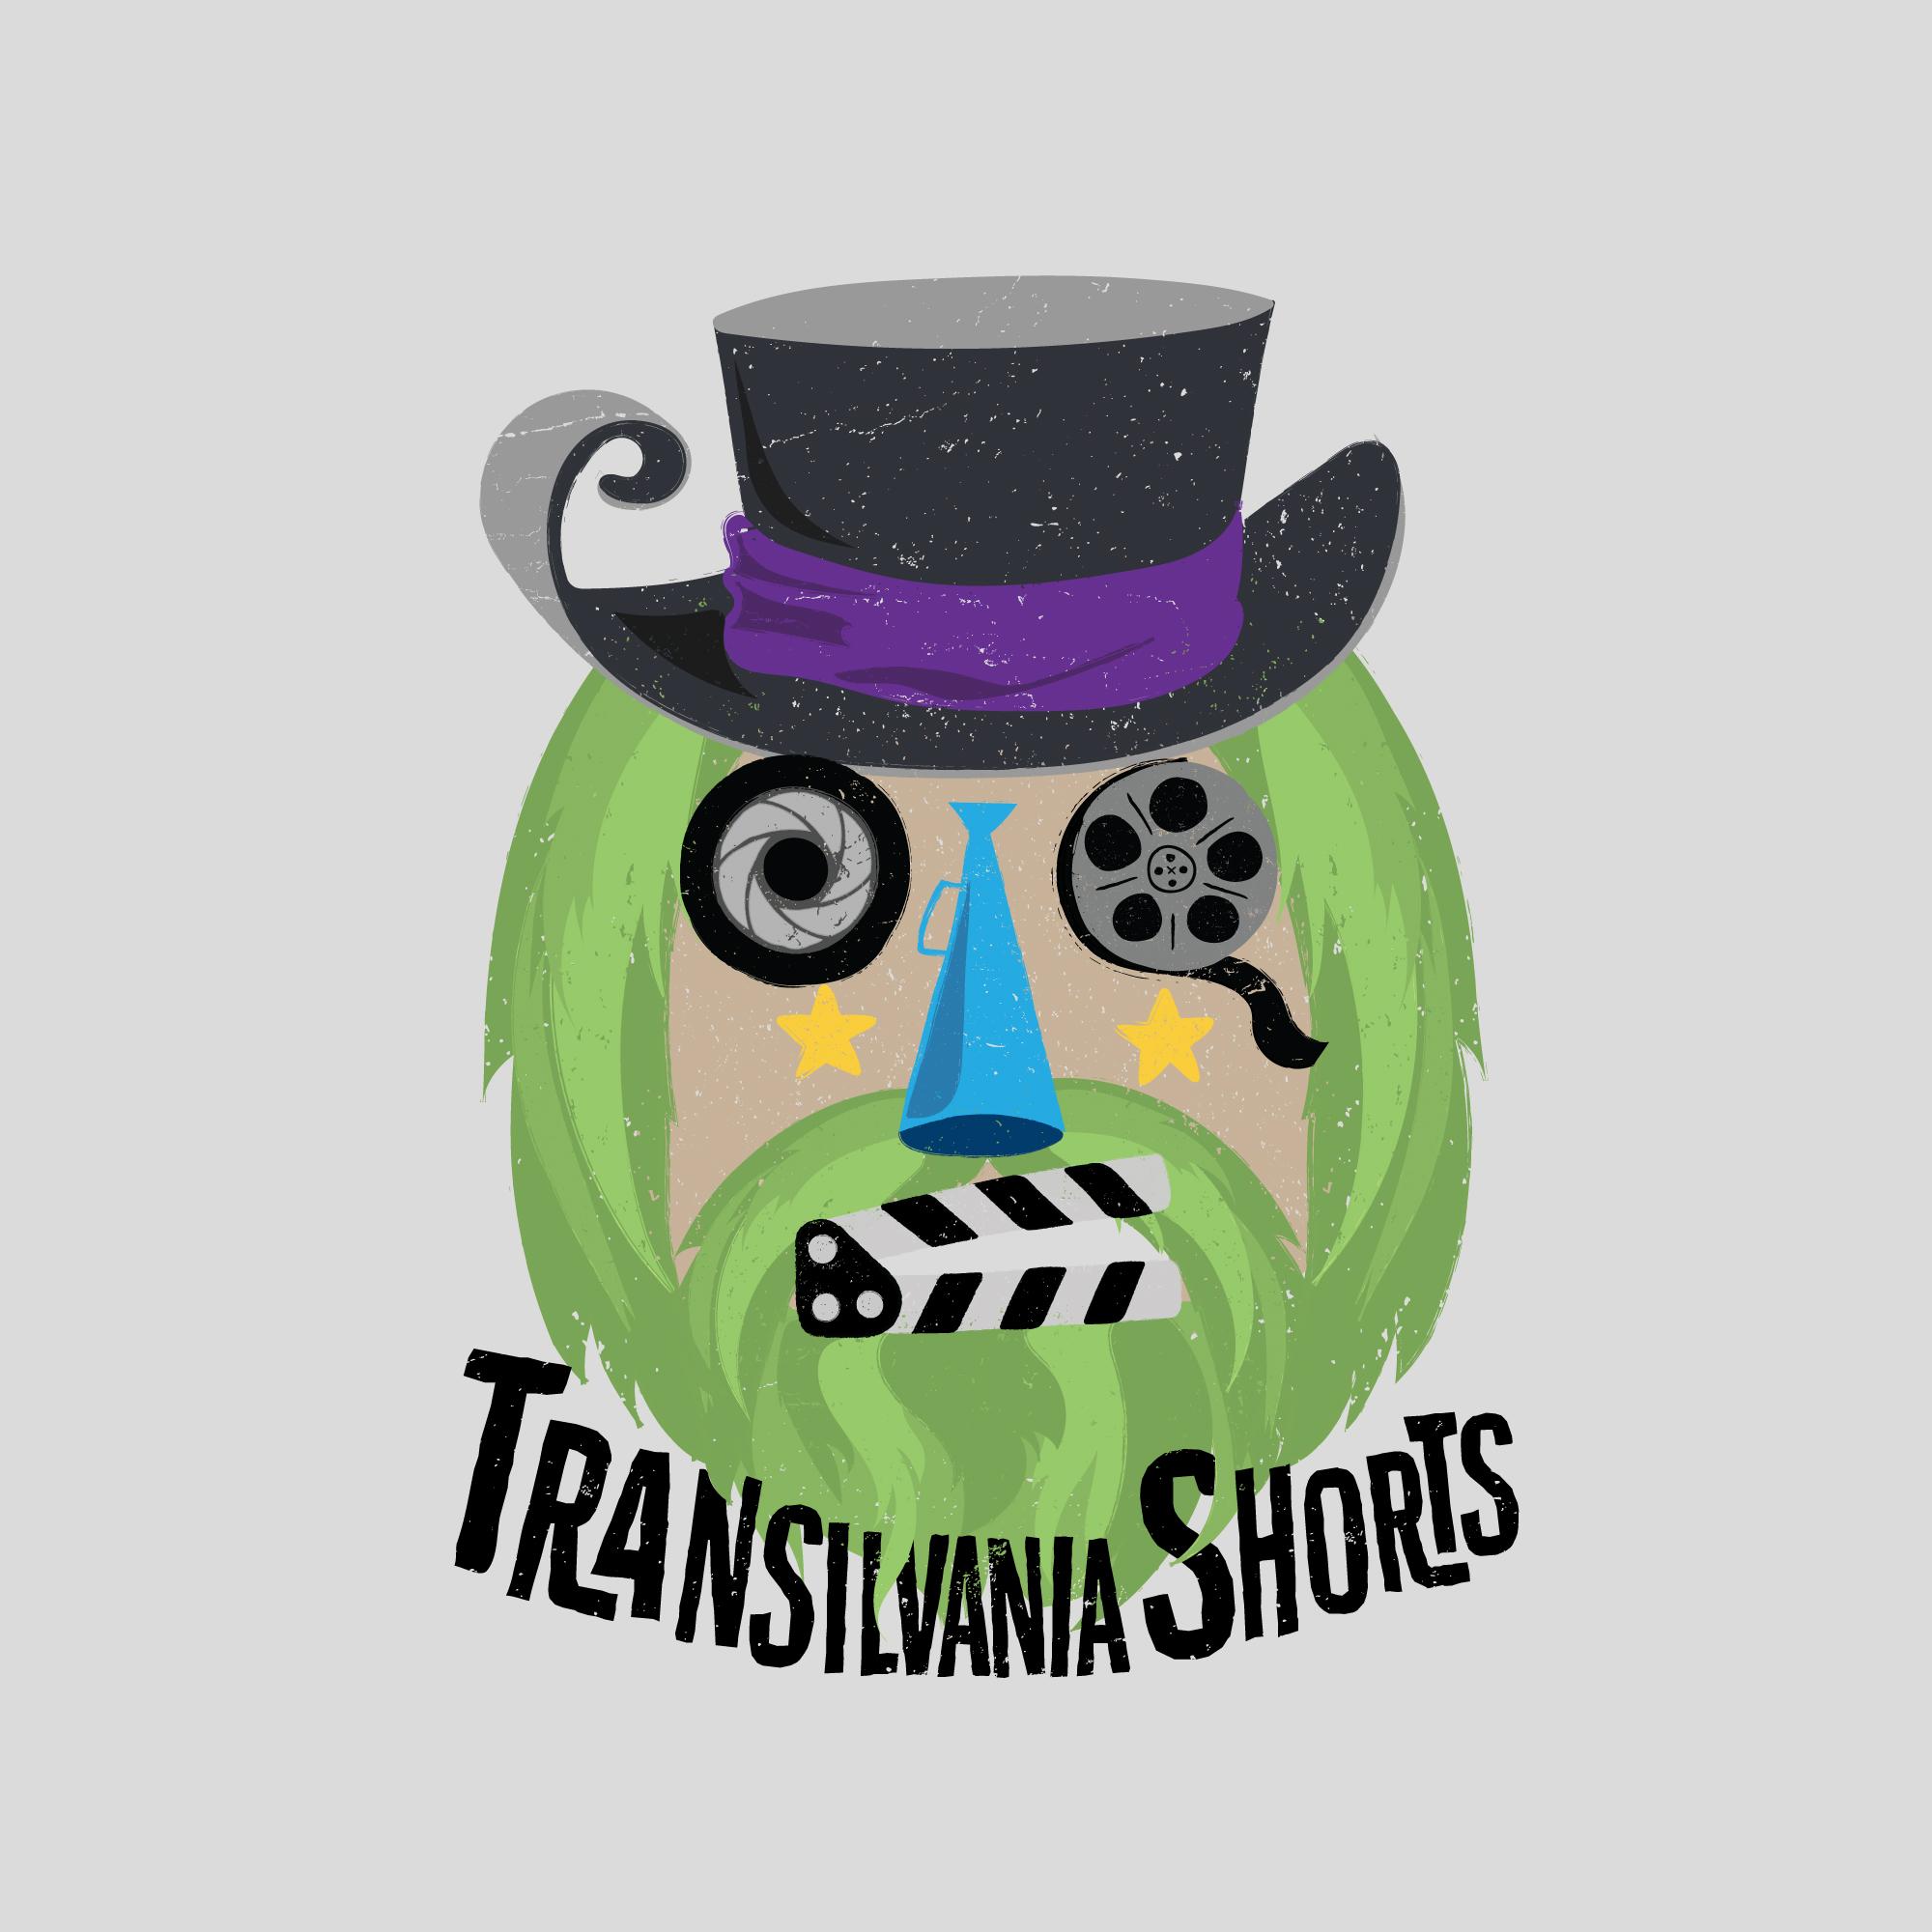 TRANSILVANIA SHORTS CALL FOR ENTRIES